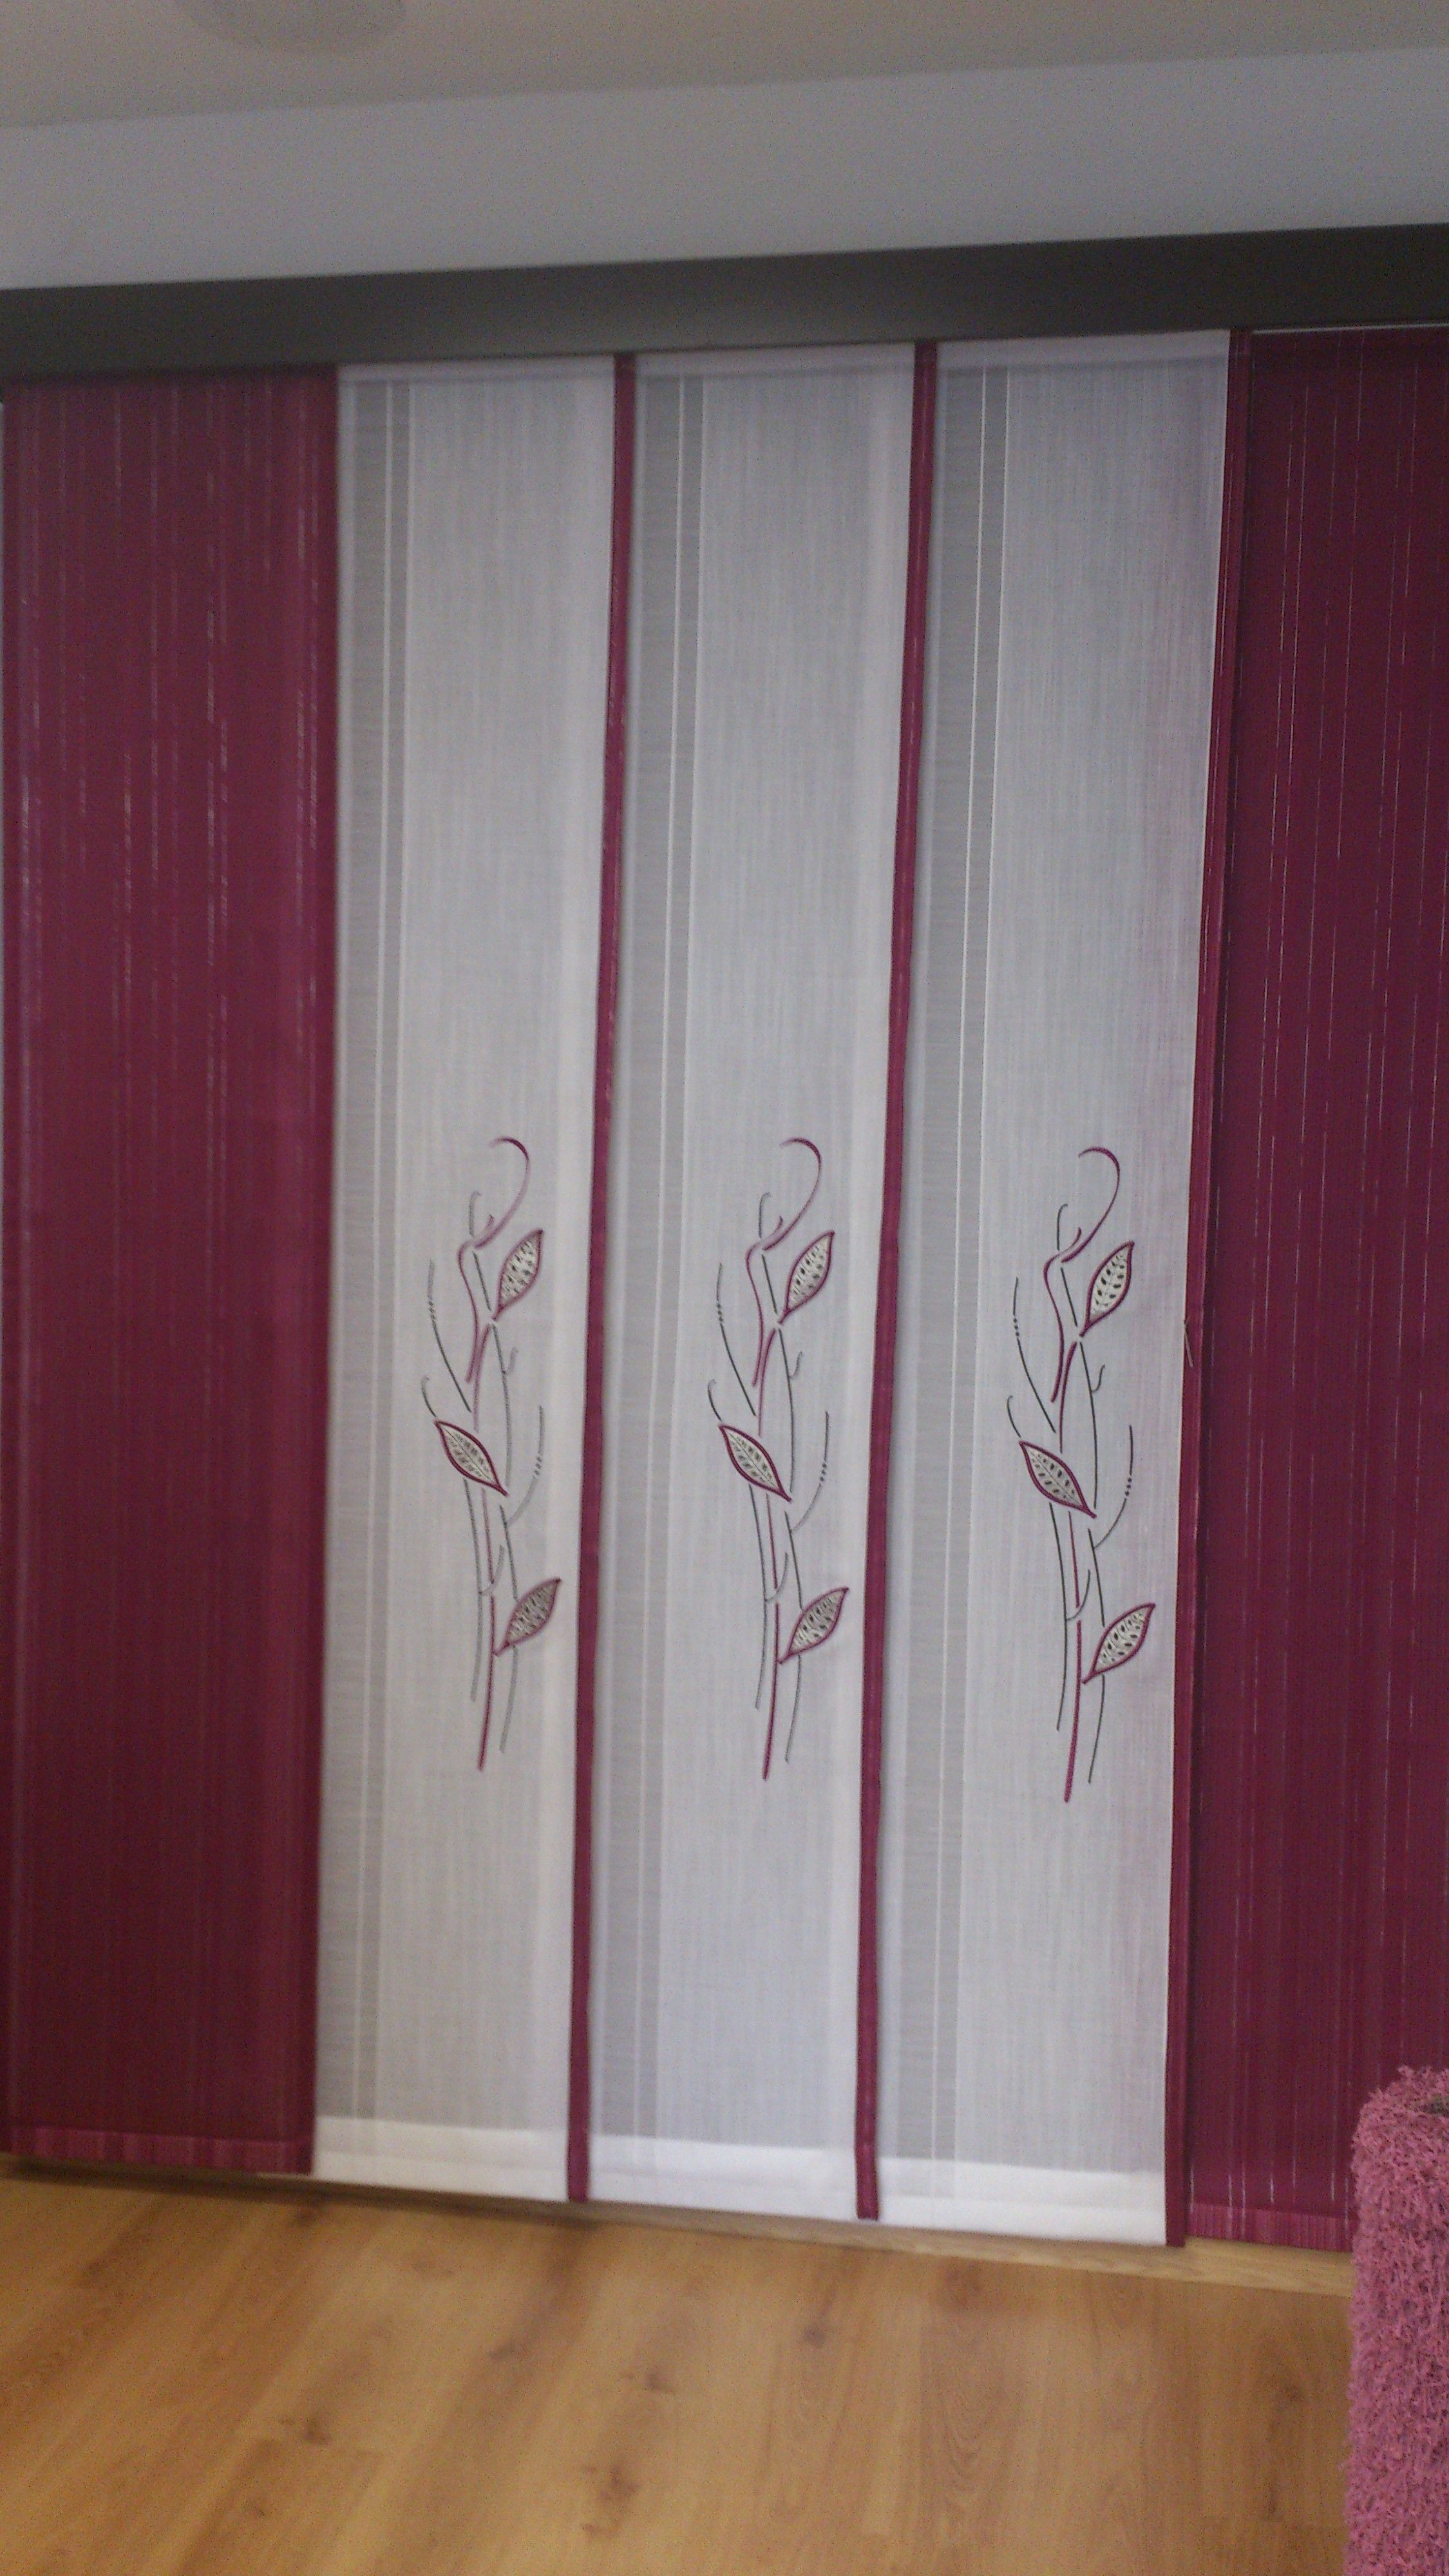 Paneles japoneses con todos berenjena proyectos que intentar pinterest cortinas paneles - Fotos panel japones ...